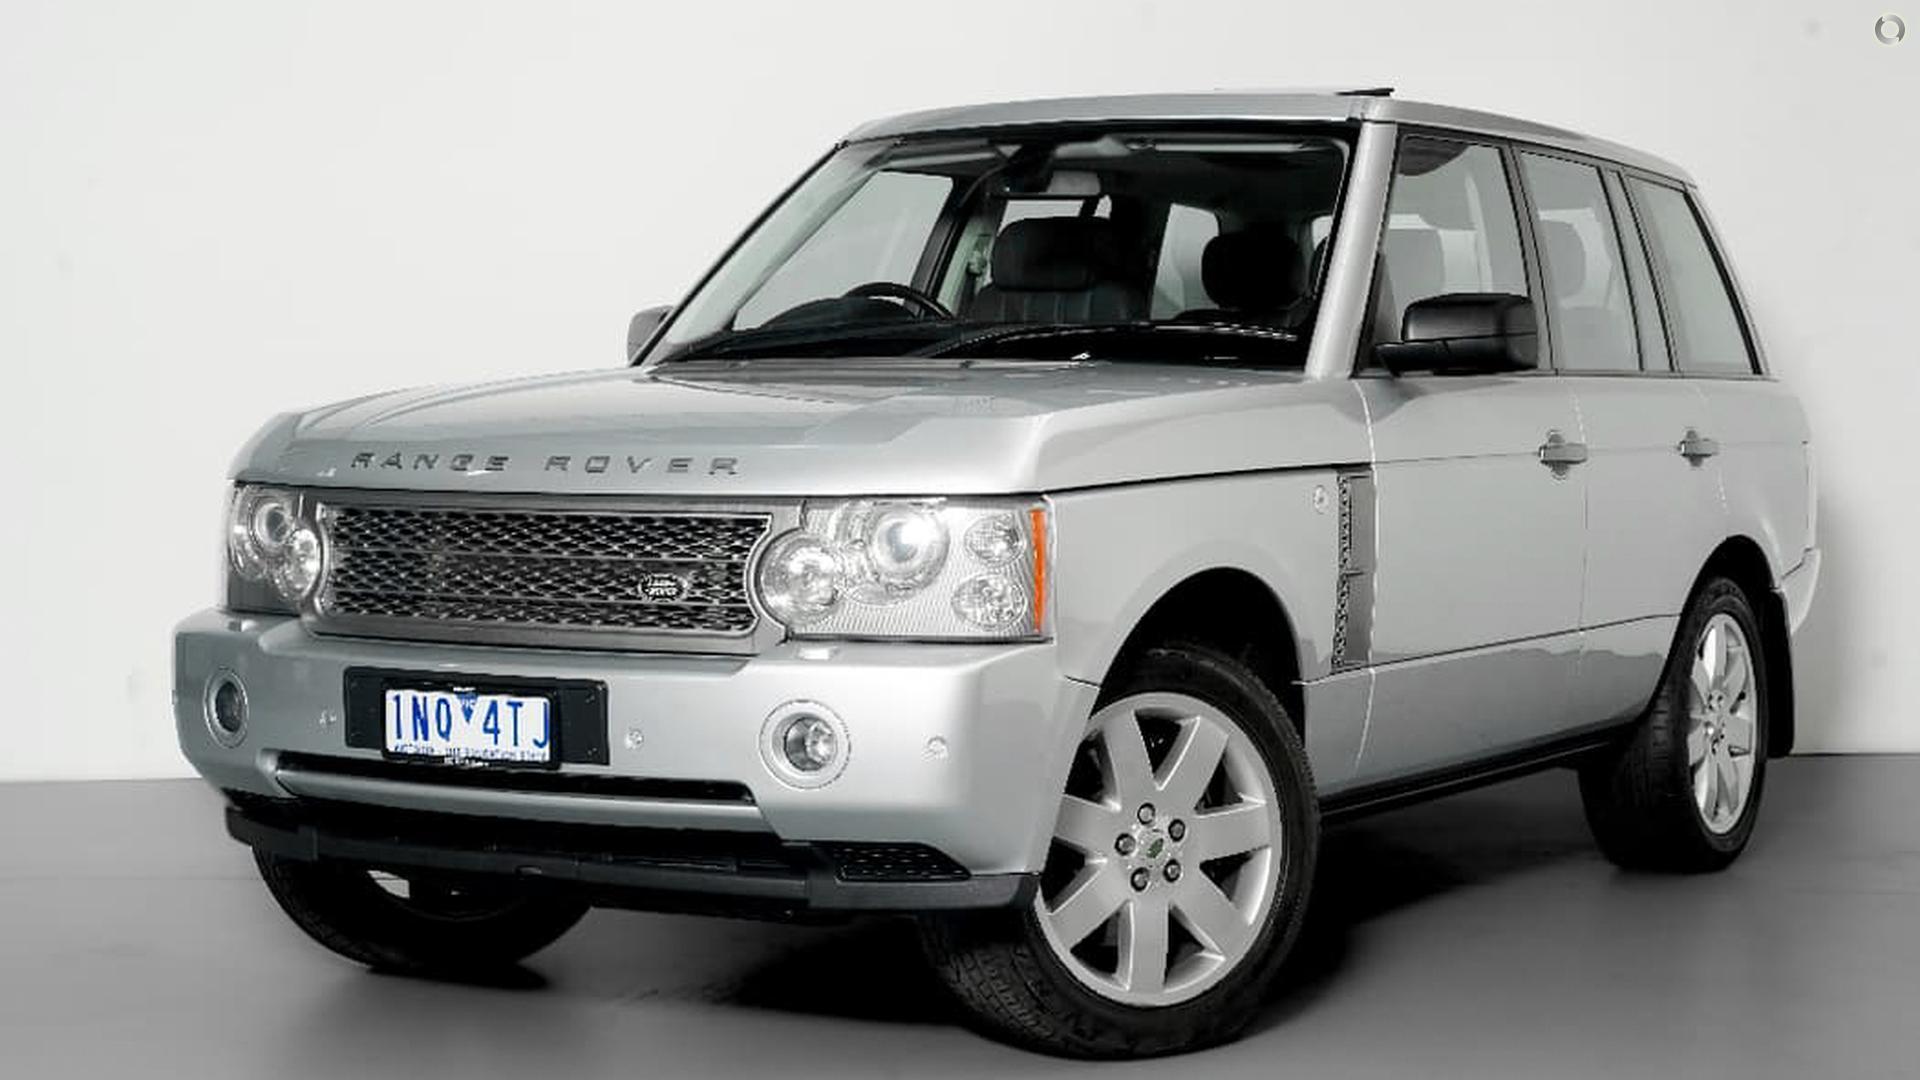 2007 Land Rover Range Rover Vogue L322